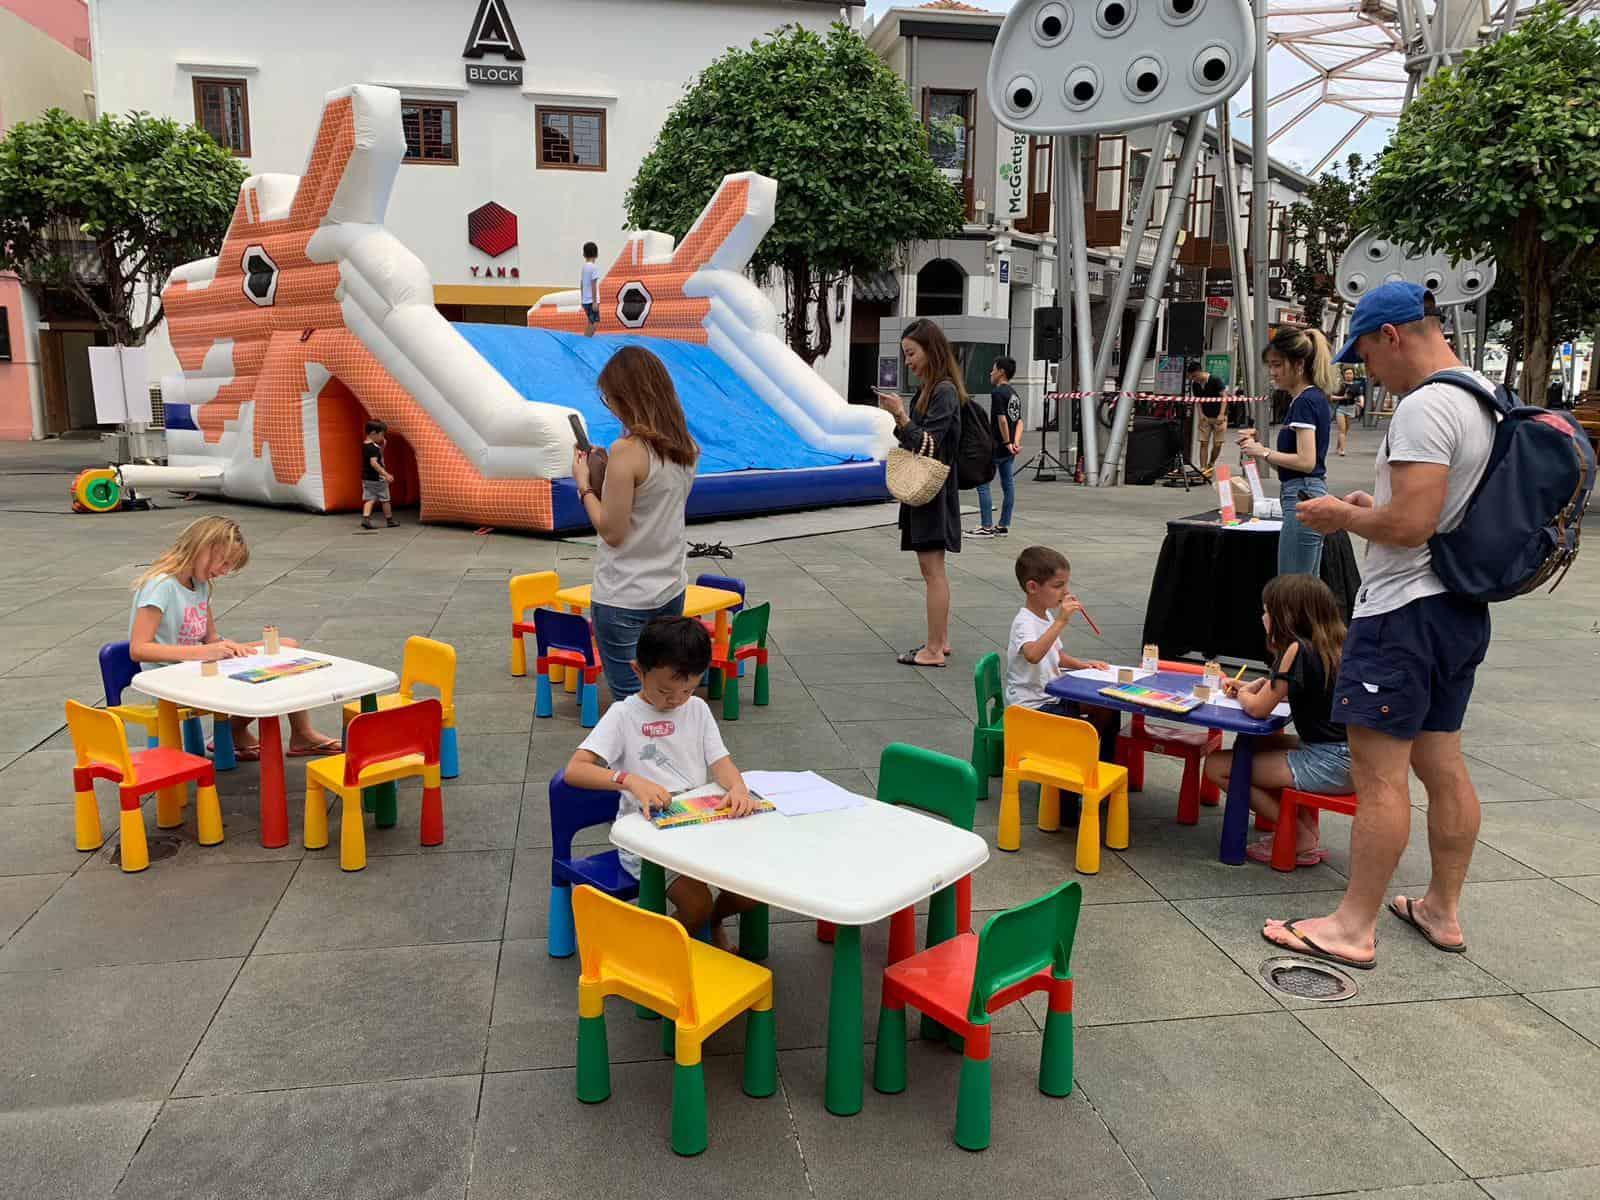 Bouncy Castle Carnival Event Equipment Rental Singapore